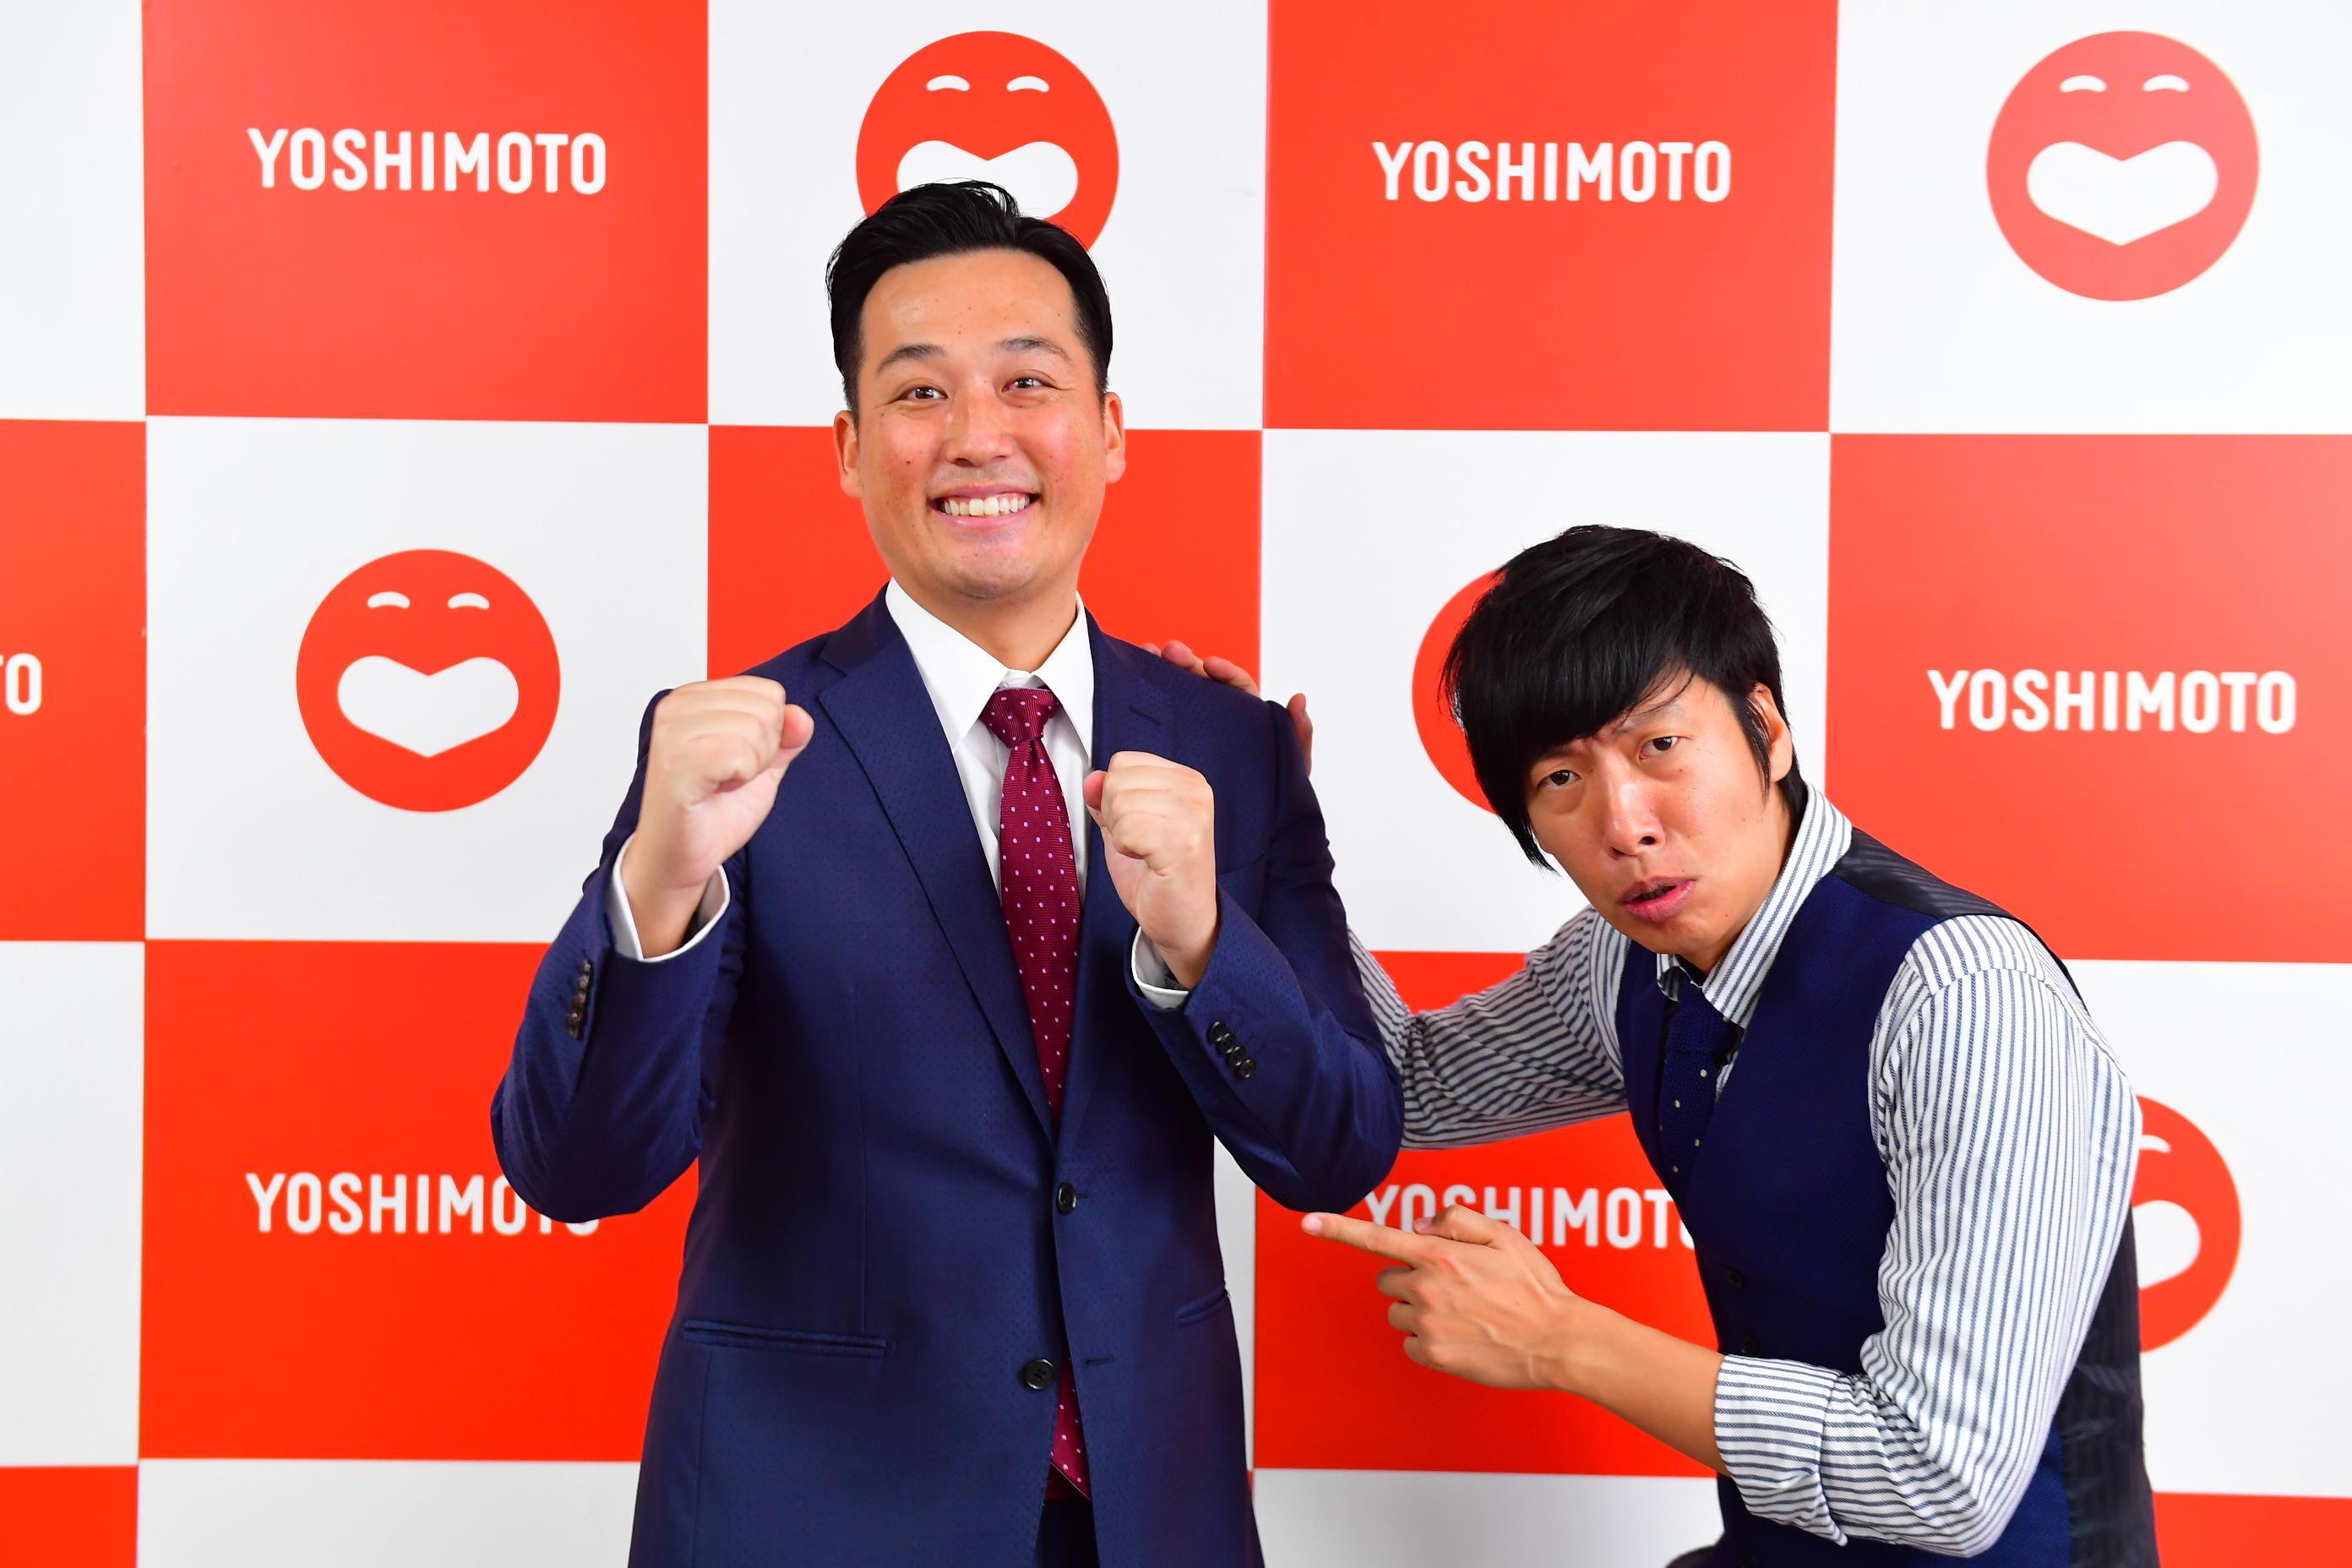 http://news.yoshimoto.co.jp/20171227162750-5bede74403445aa734ef989573b62bcf2f8ce8bb.jpg